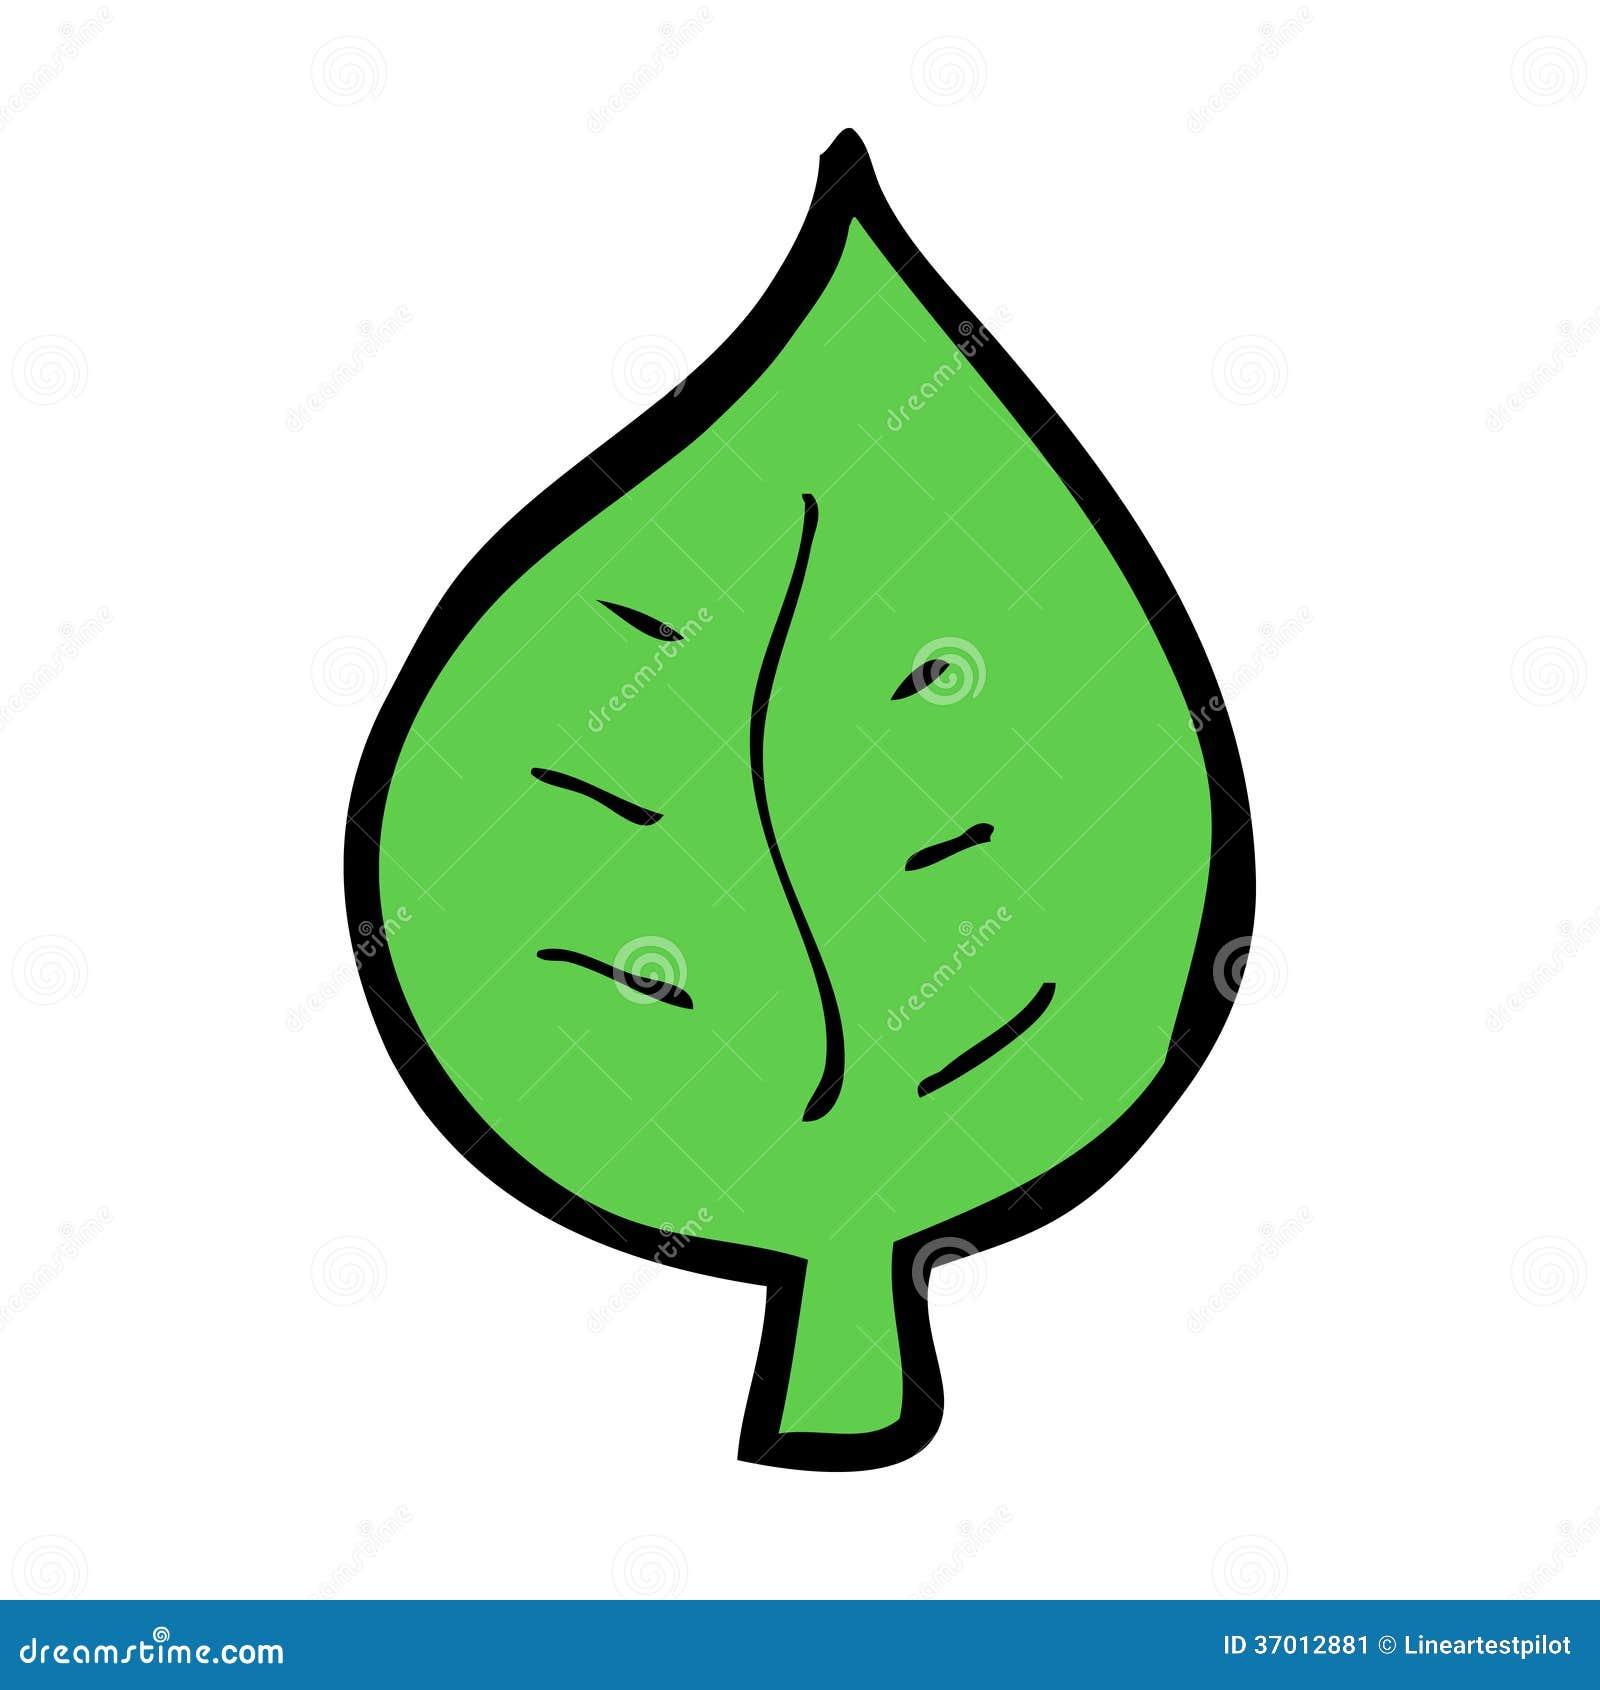 cartoon leaf symbol hand drawn illustration retro style vector available 37012881